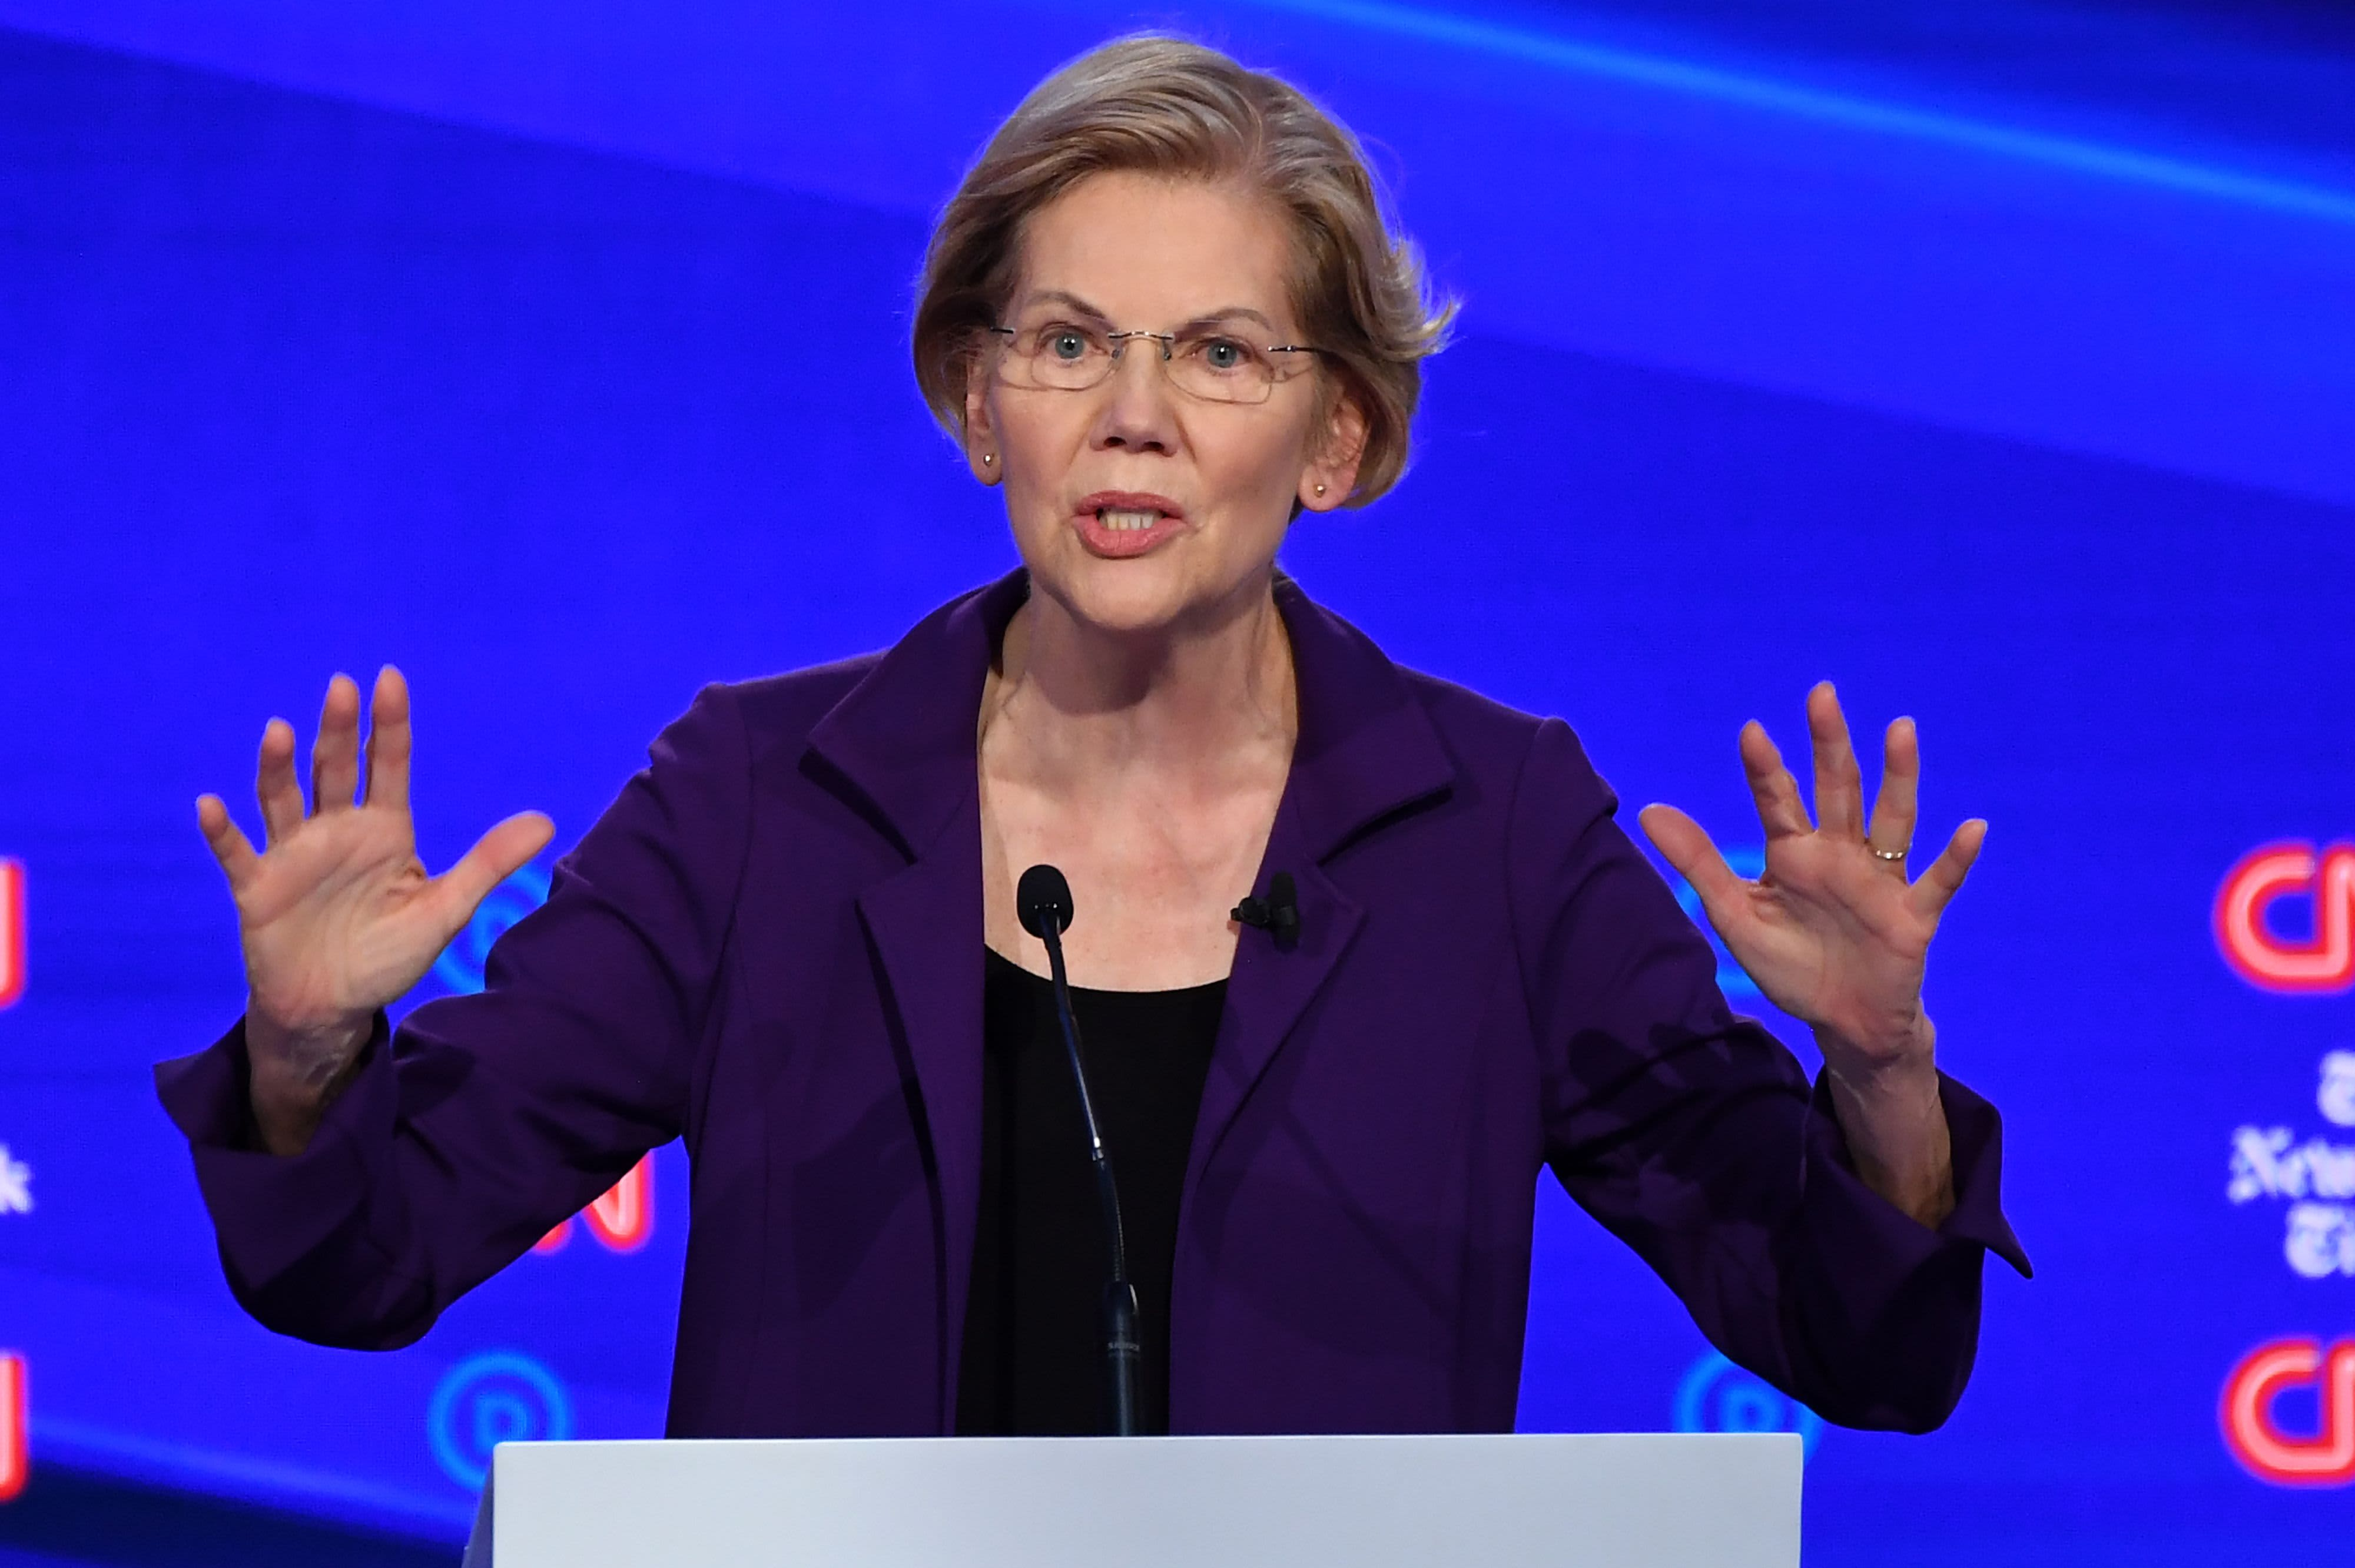 Elizabeth Warren shares a 'calculator for billionaires' for her wealth tax plan